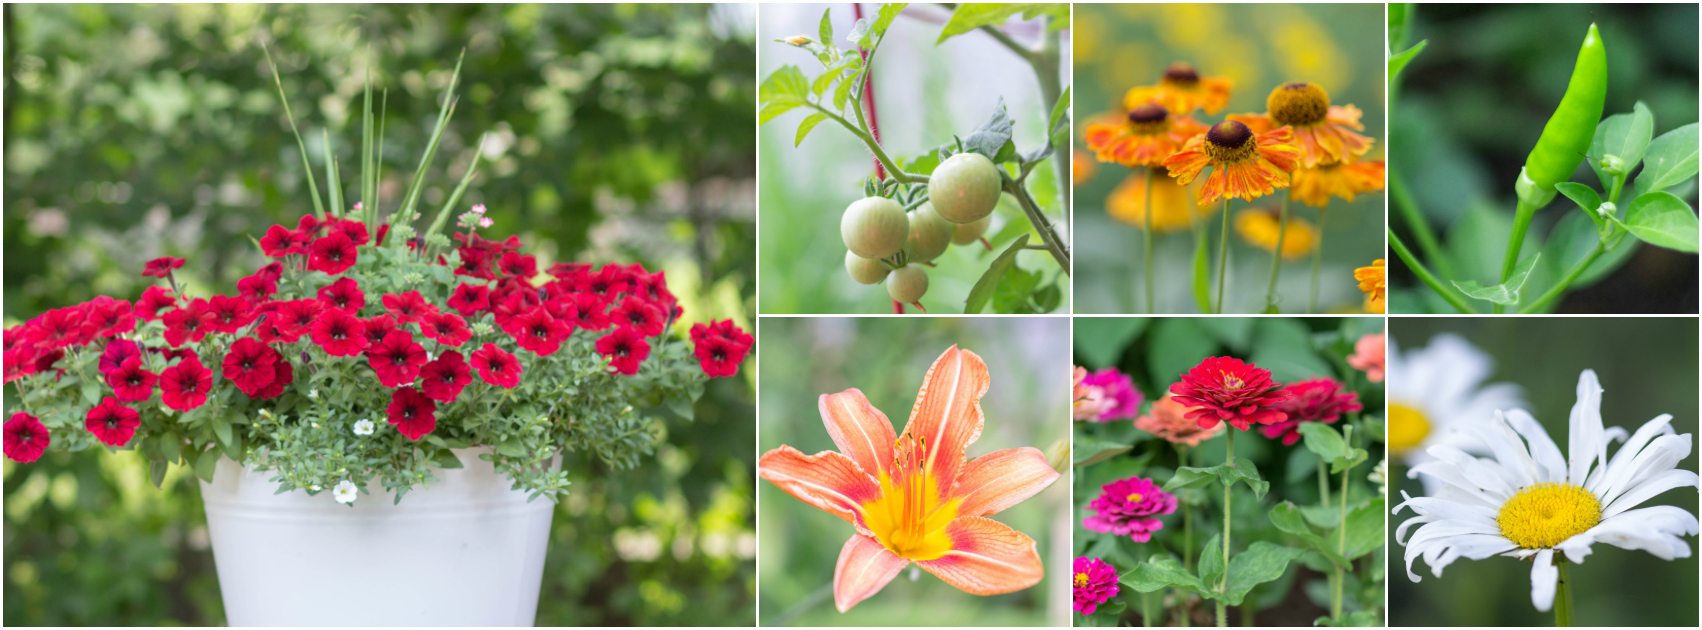 July Garden Tour | angiethefreckledrose.com